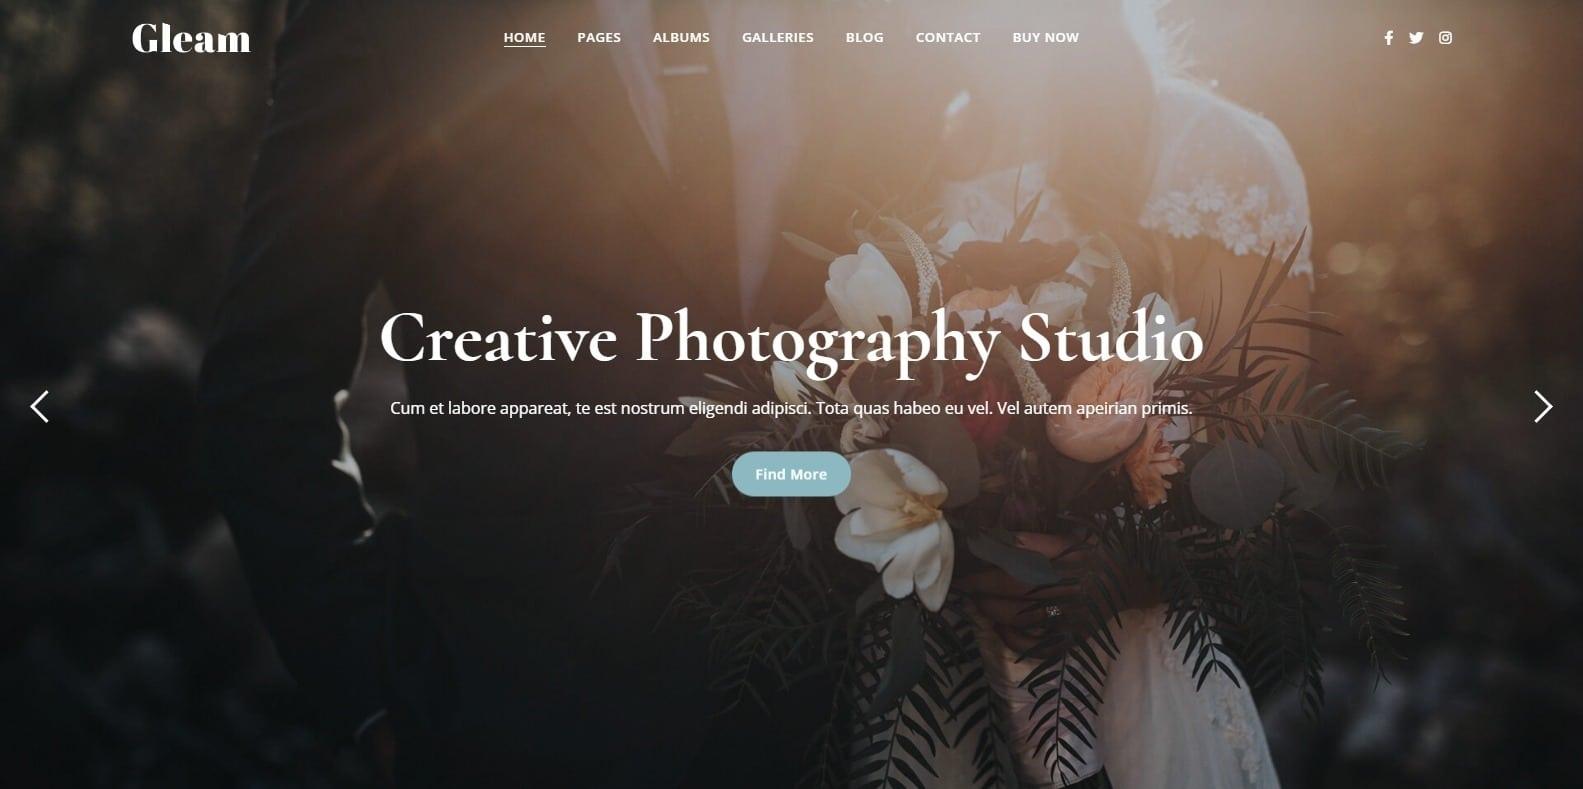 gleam-photo-gallery-templates